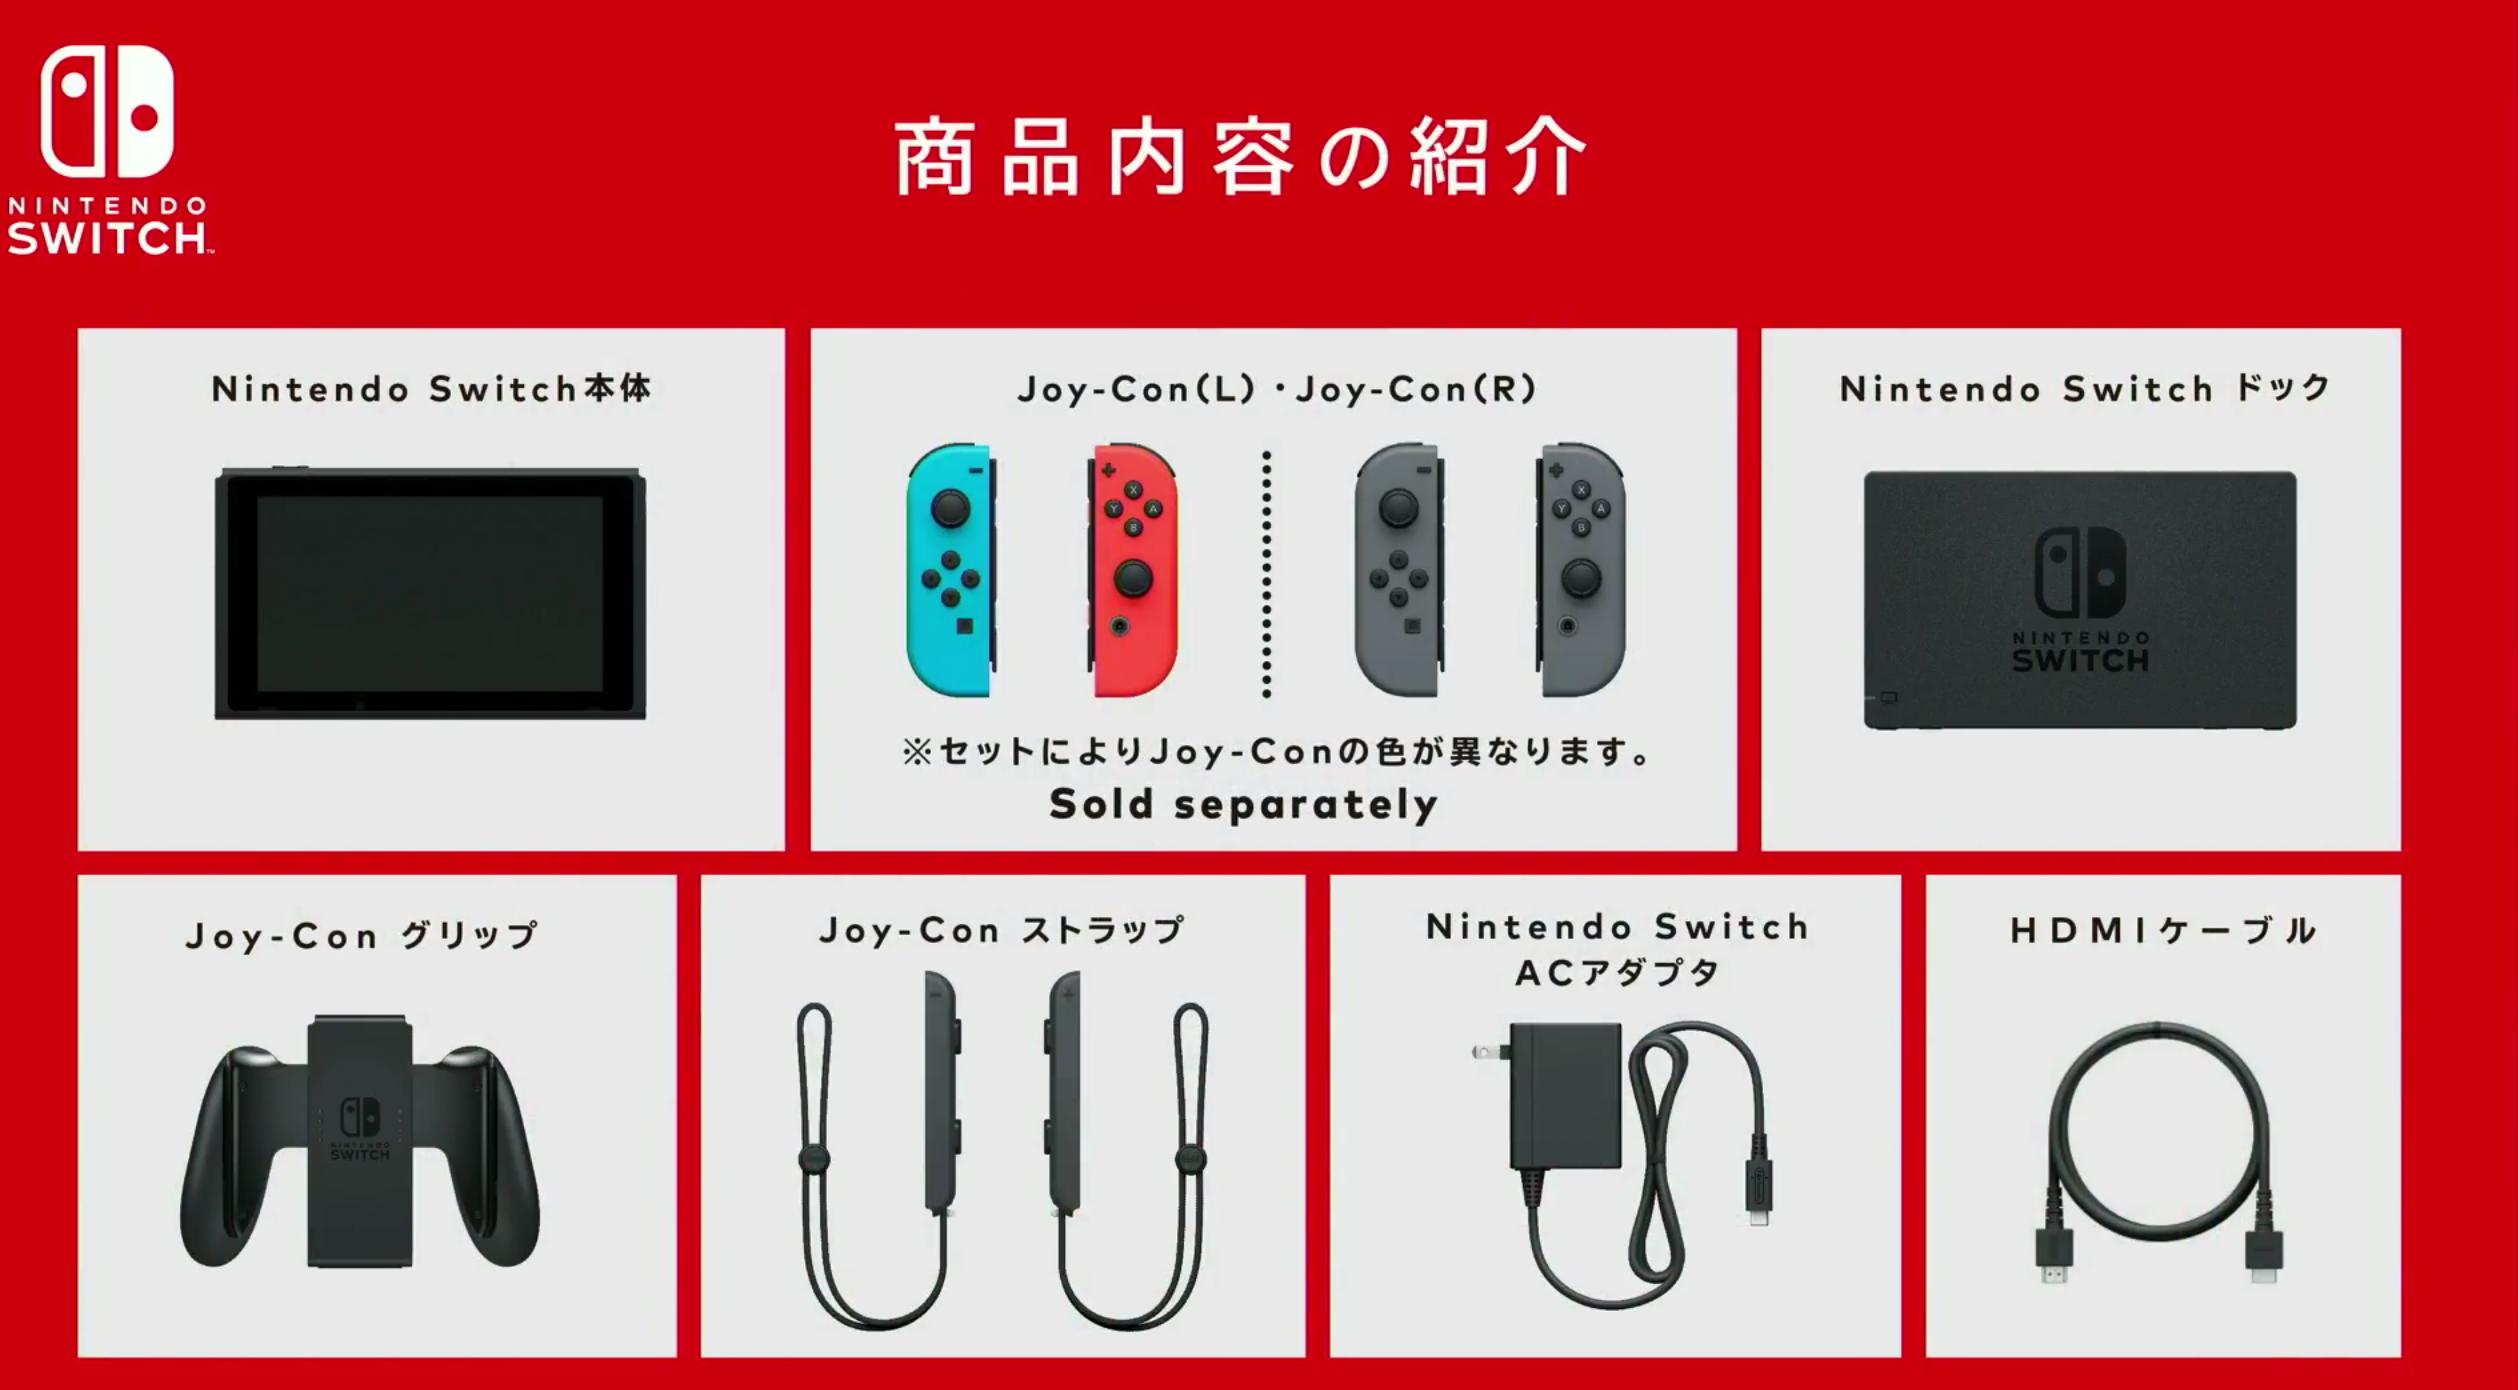 ninendo-switch-6